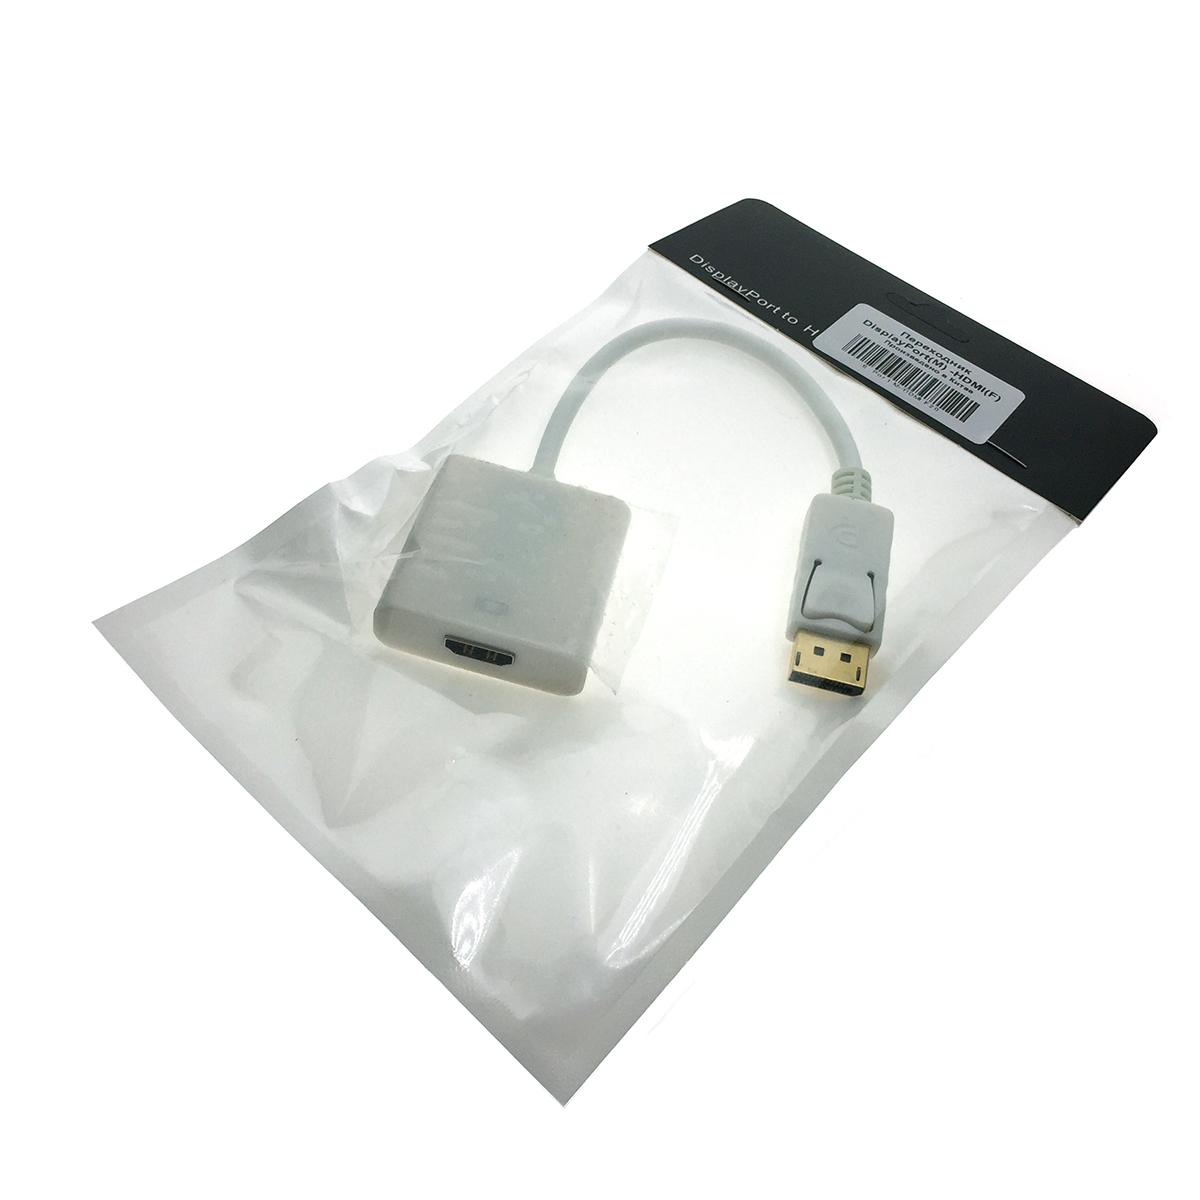 Конвертер Display Port 20 pin Male to HDMI 19 pin Female 20 см Espada EPortM-HDMIF20